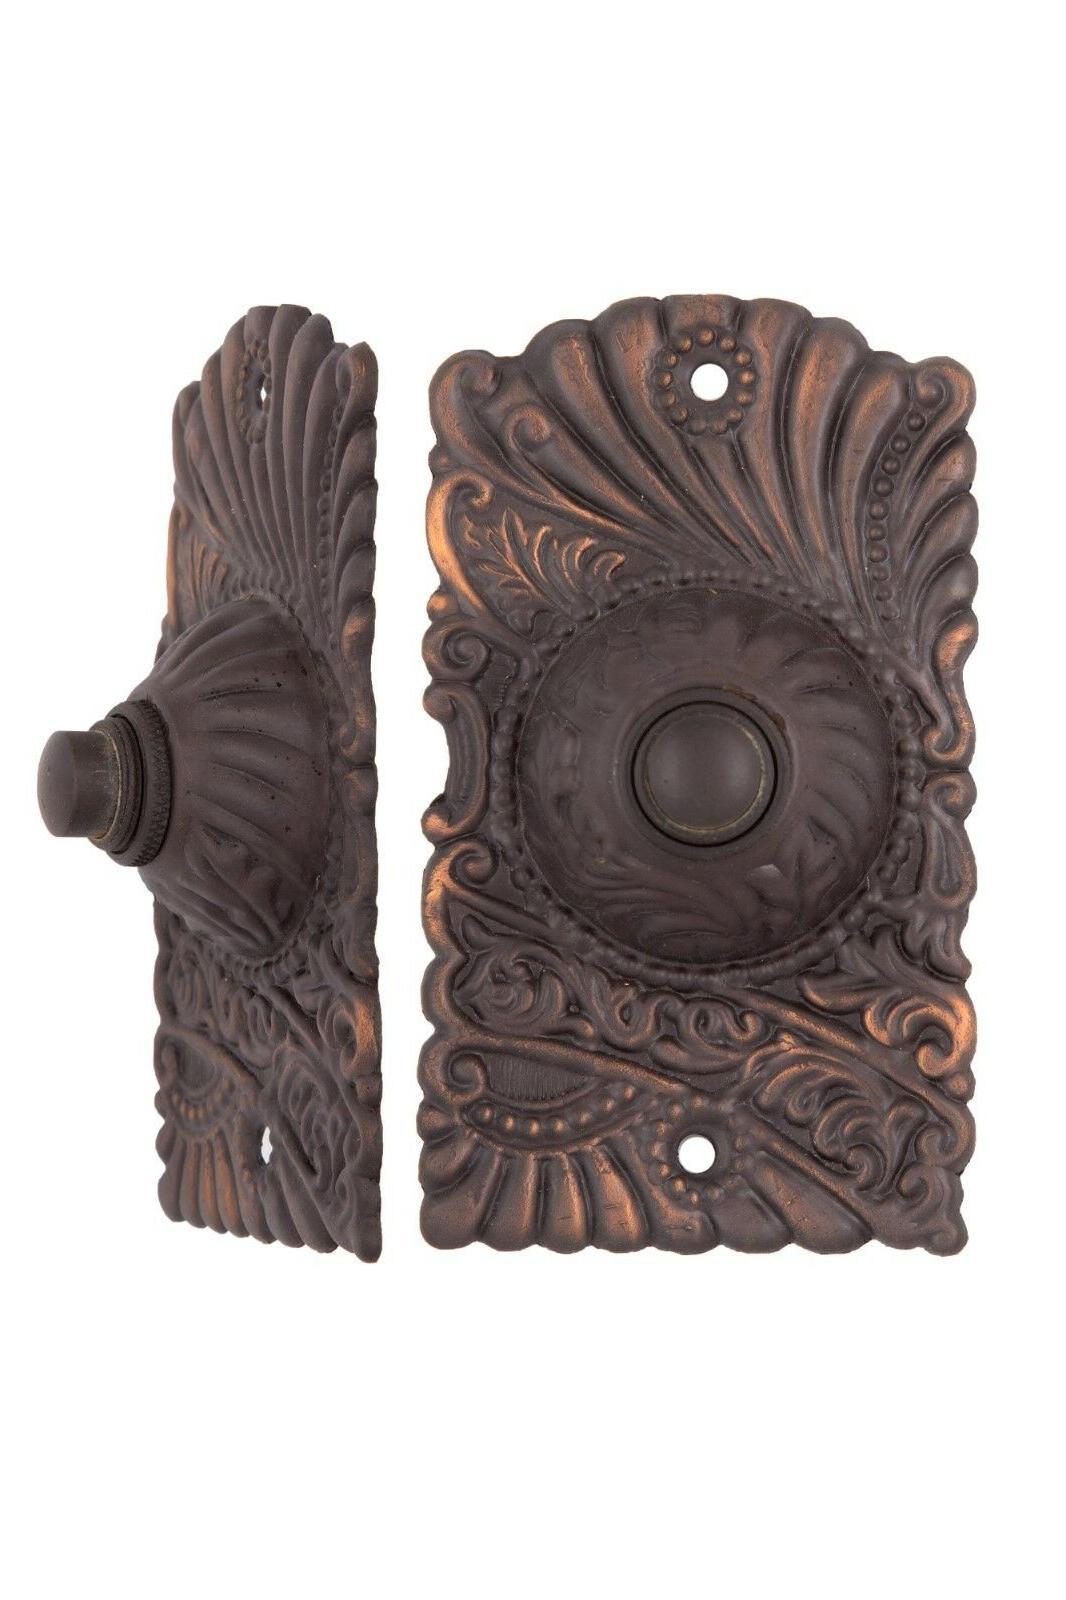 roanoke push button electric doorbell antique copper